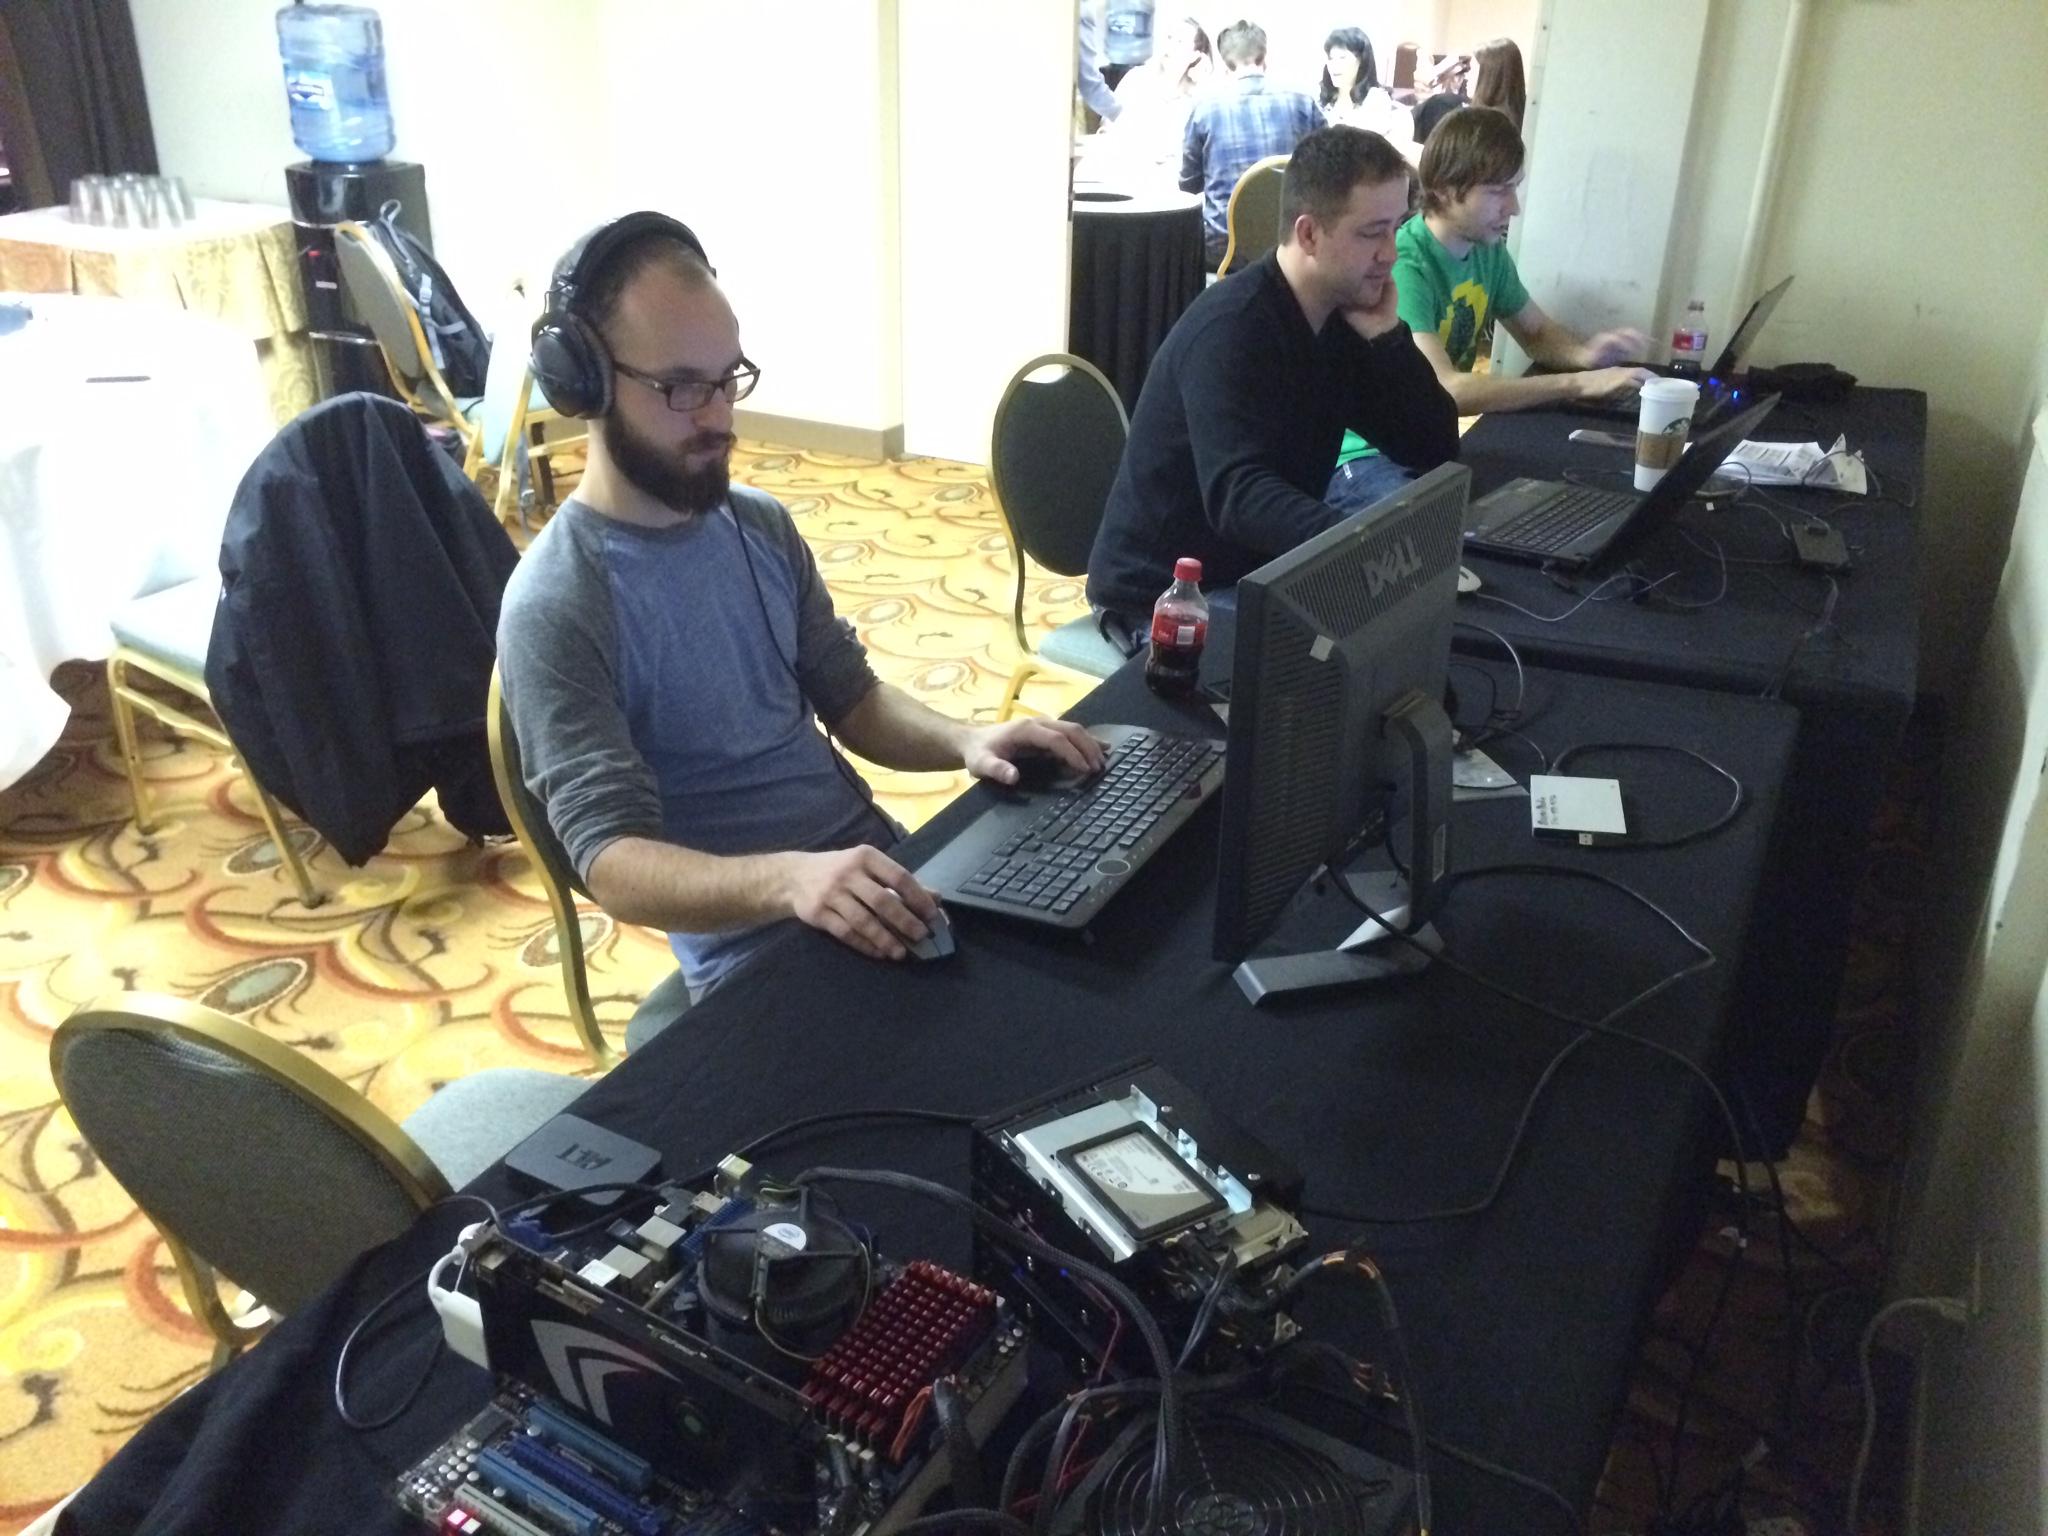 Tech team hard at work